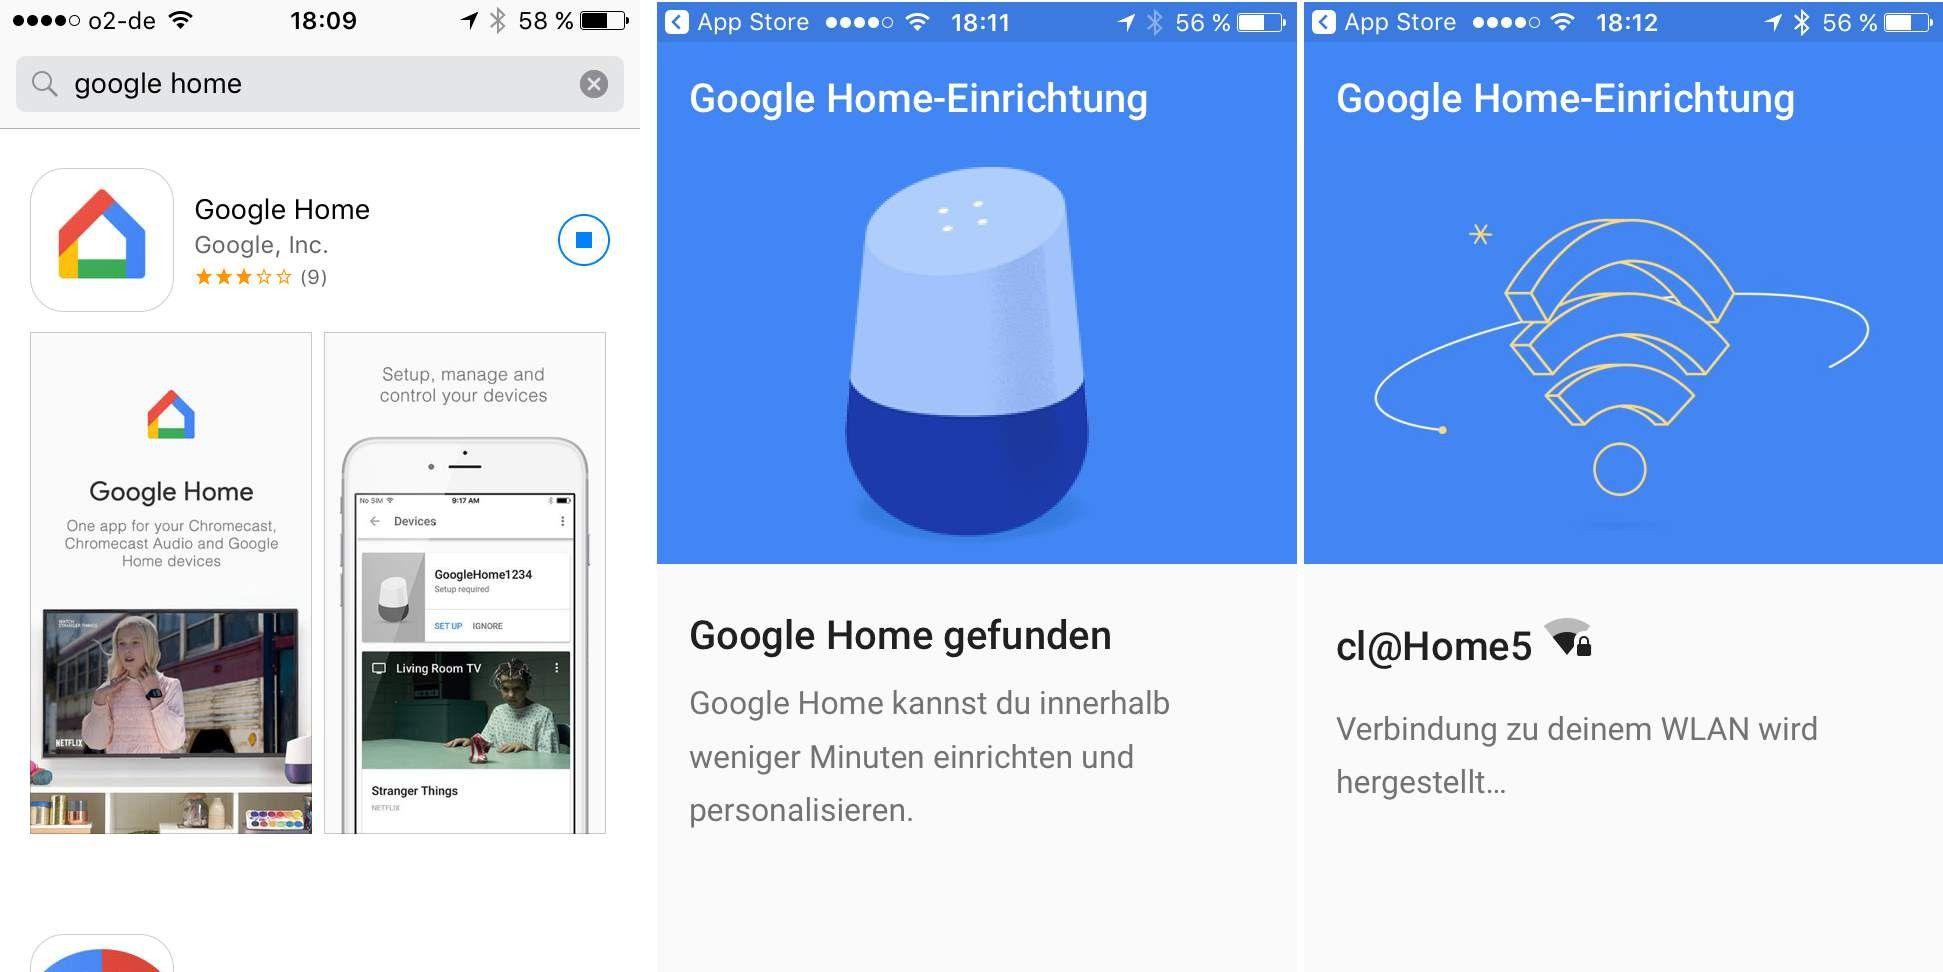 google home chromecast im test schlauer als alexa macwelt. Black Bedroom Furniture Sets. Home Design Ideas